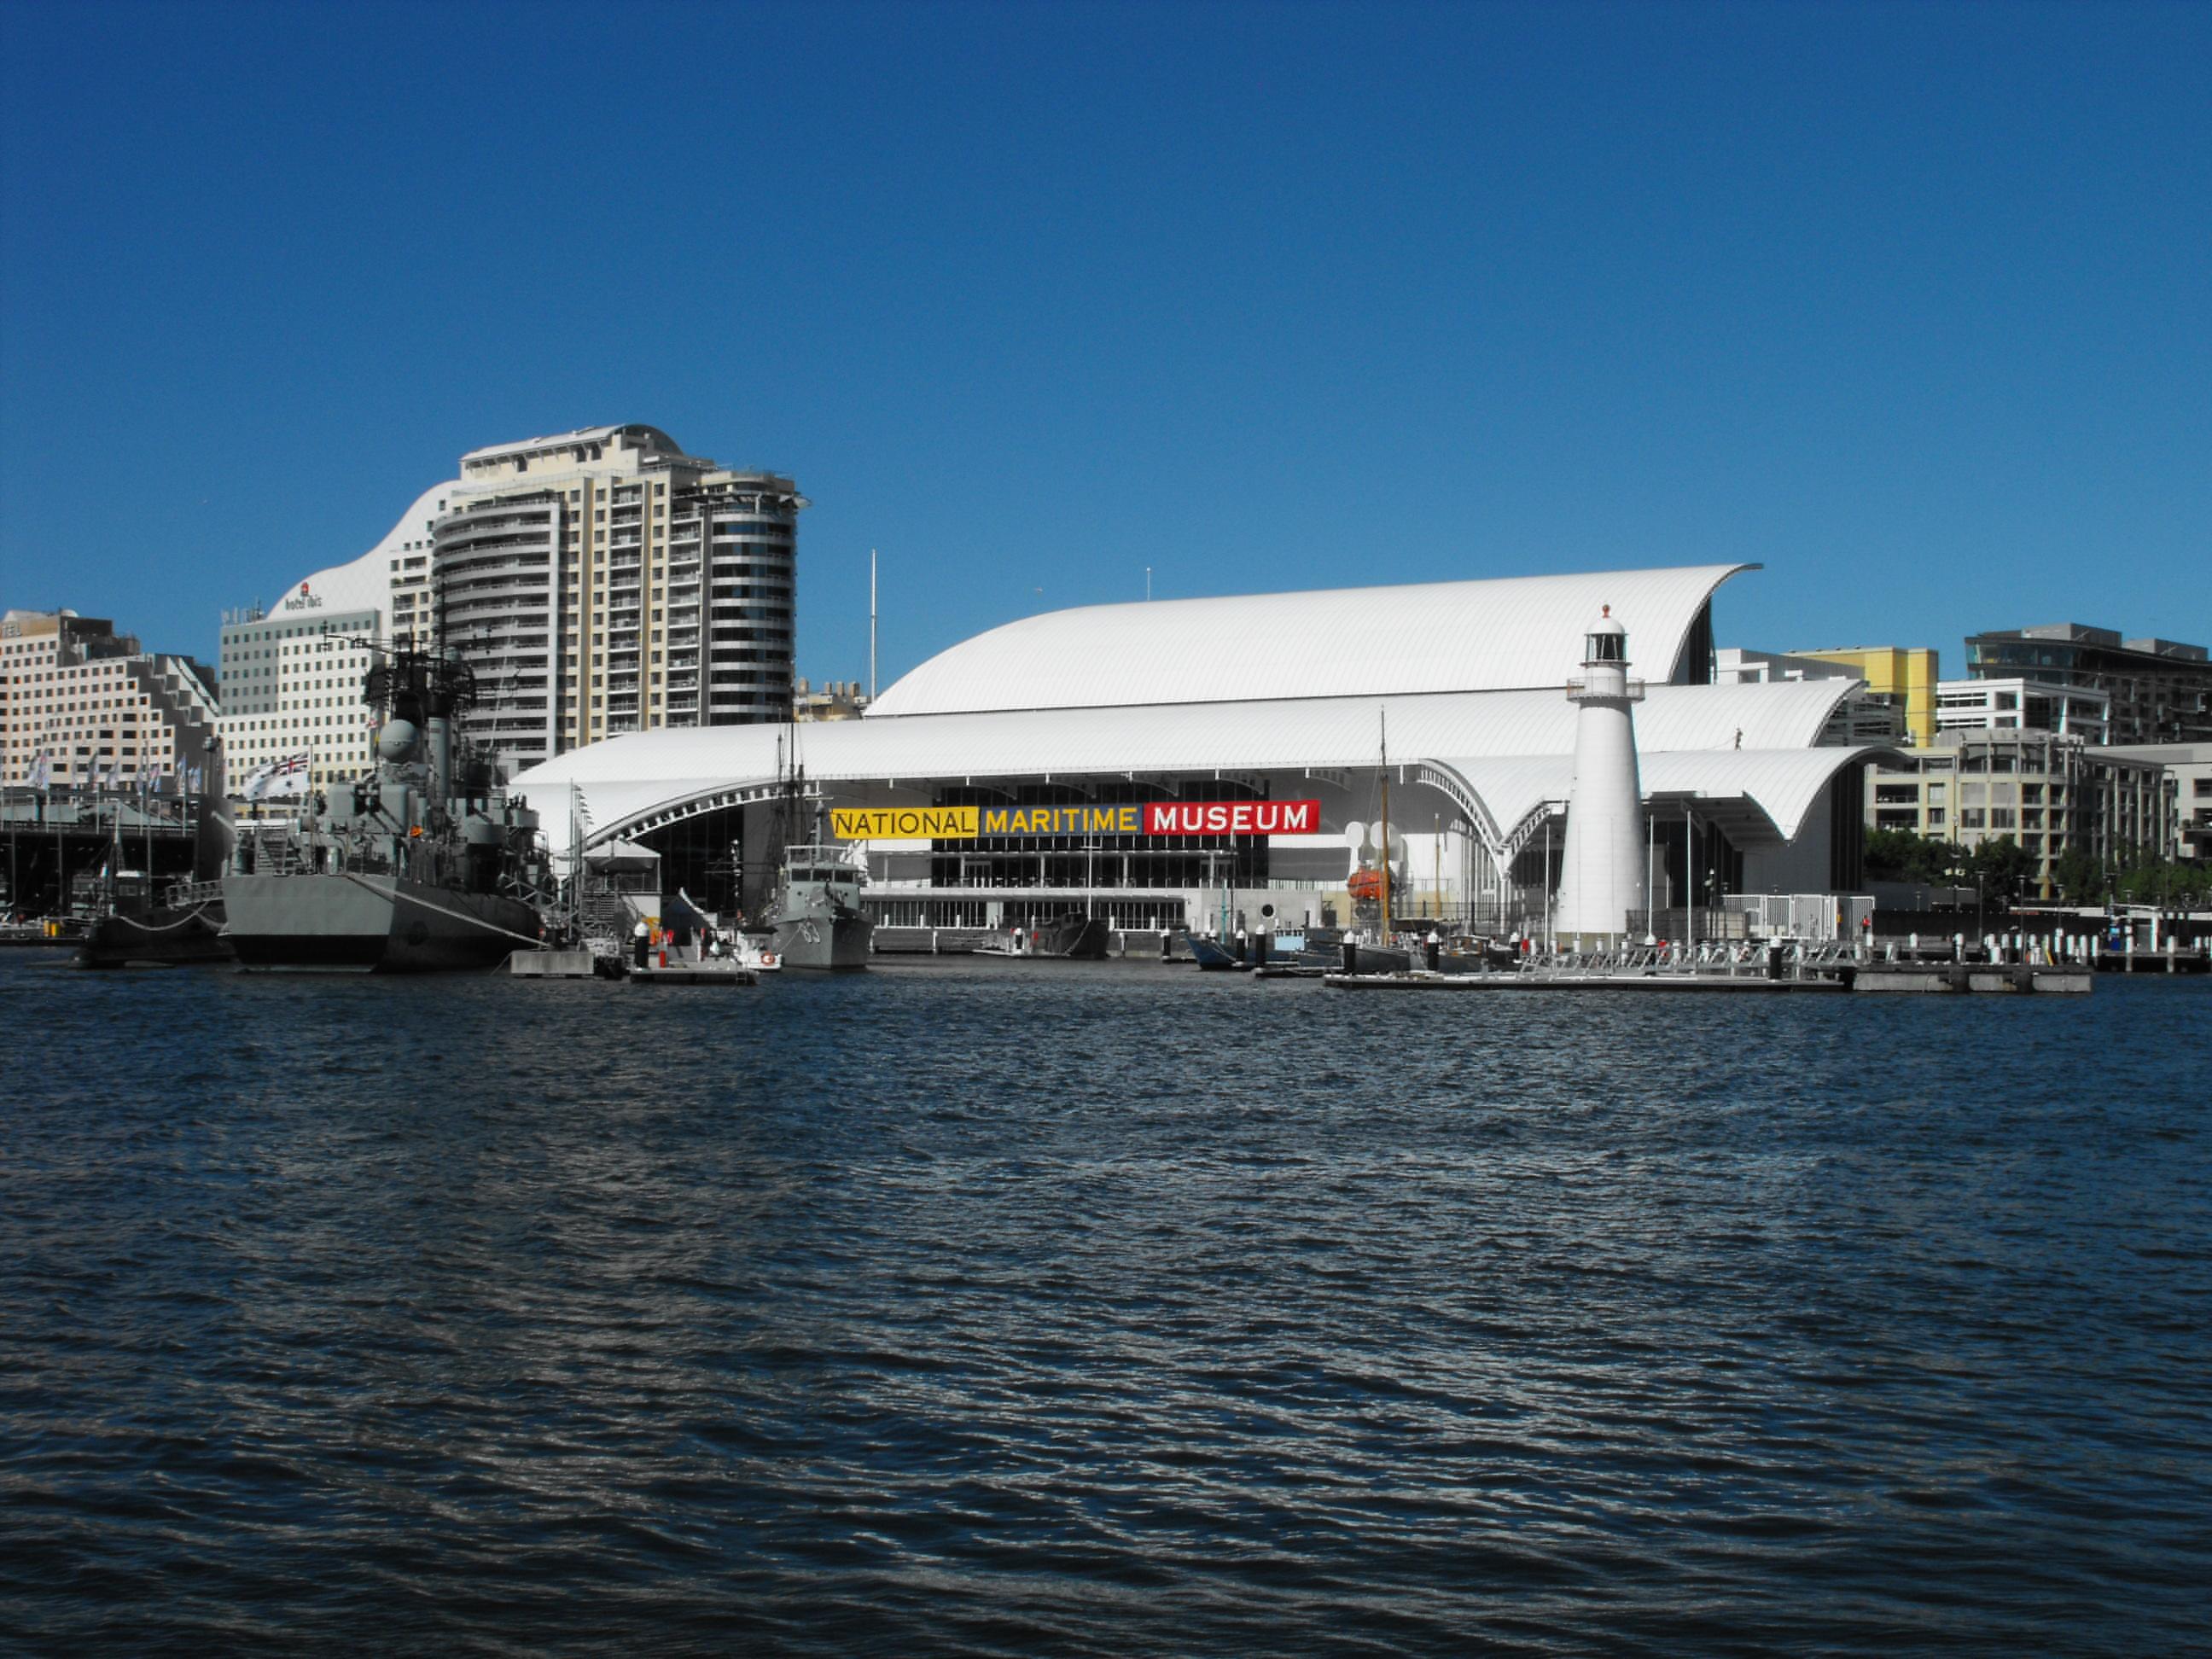 The National Sydney Tour